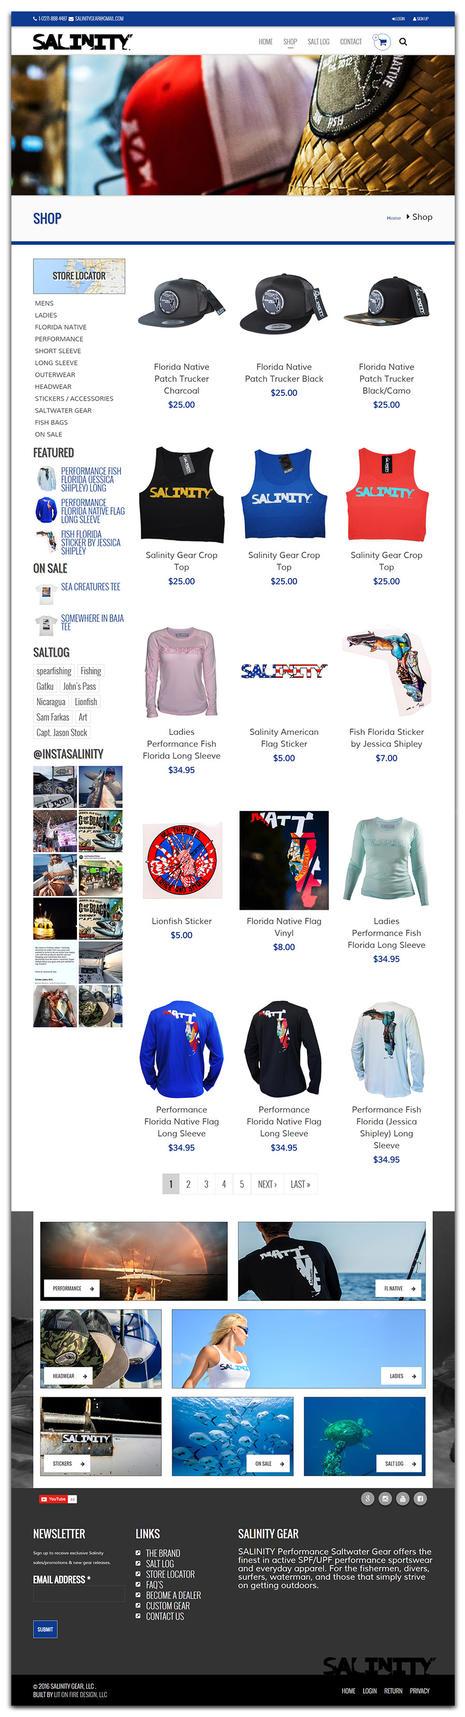 Salinity Gear Responsive Web Design 2 by slater101